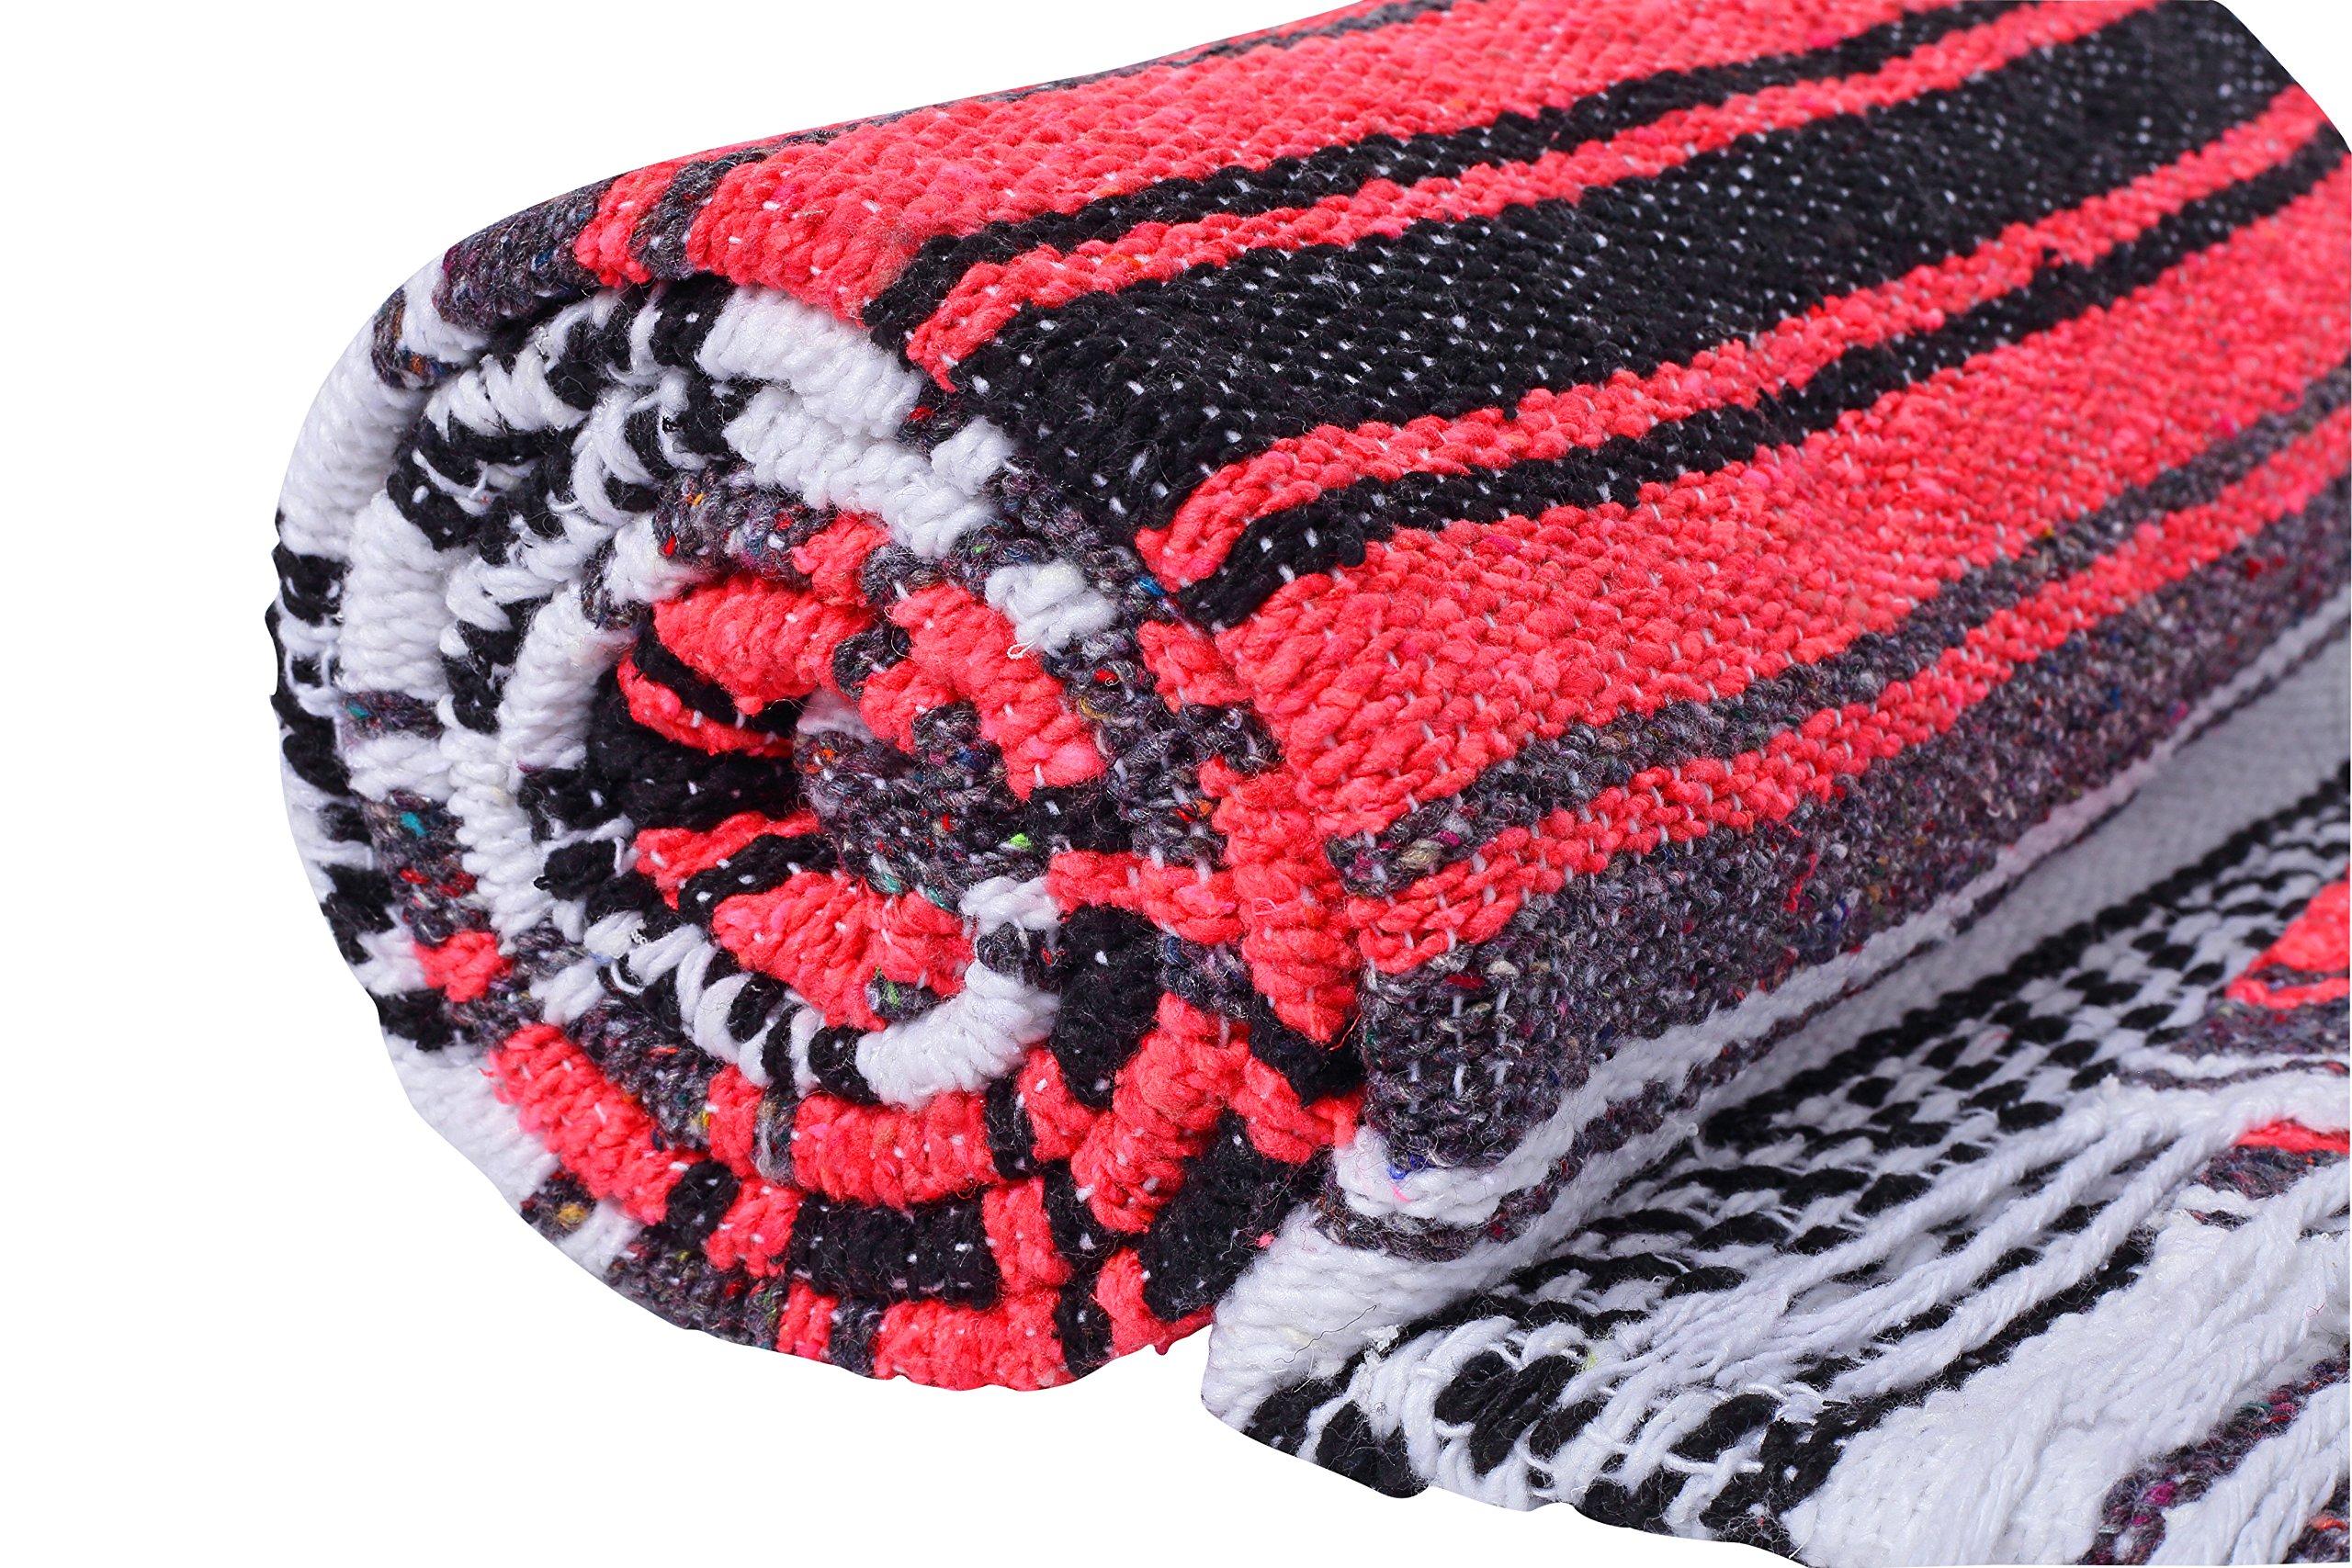 El Paso Designs Genuine Mexican Falsa Blanket - Yoga Studio Blanket, Colorful, Soft Woven Serape Imported from Mexico (Bright Coral) by El Paso Designs (Image #7)